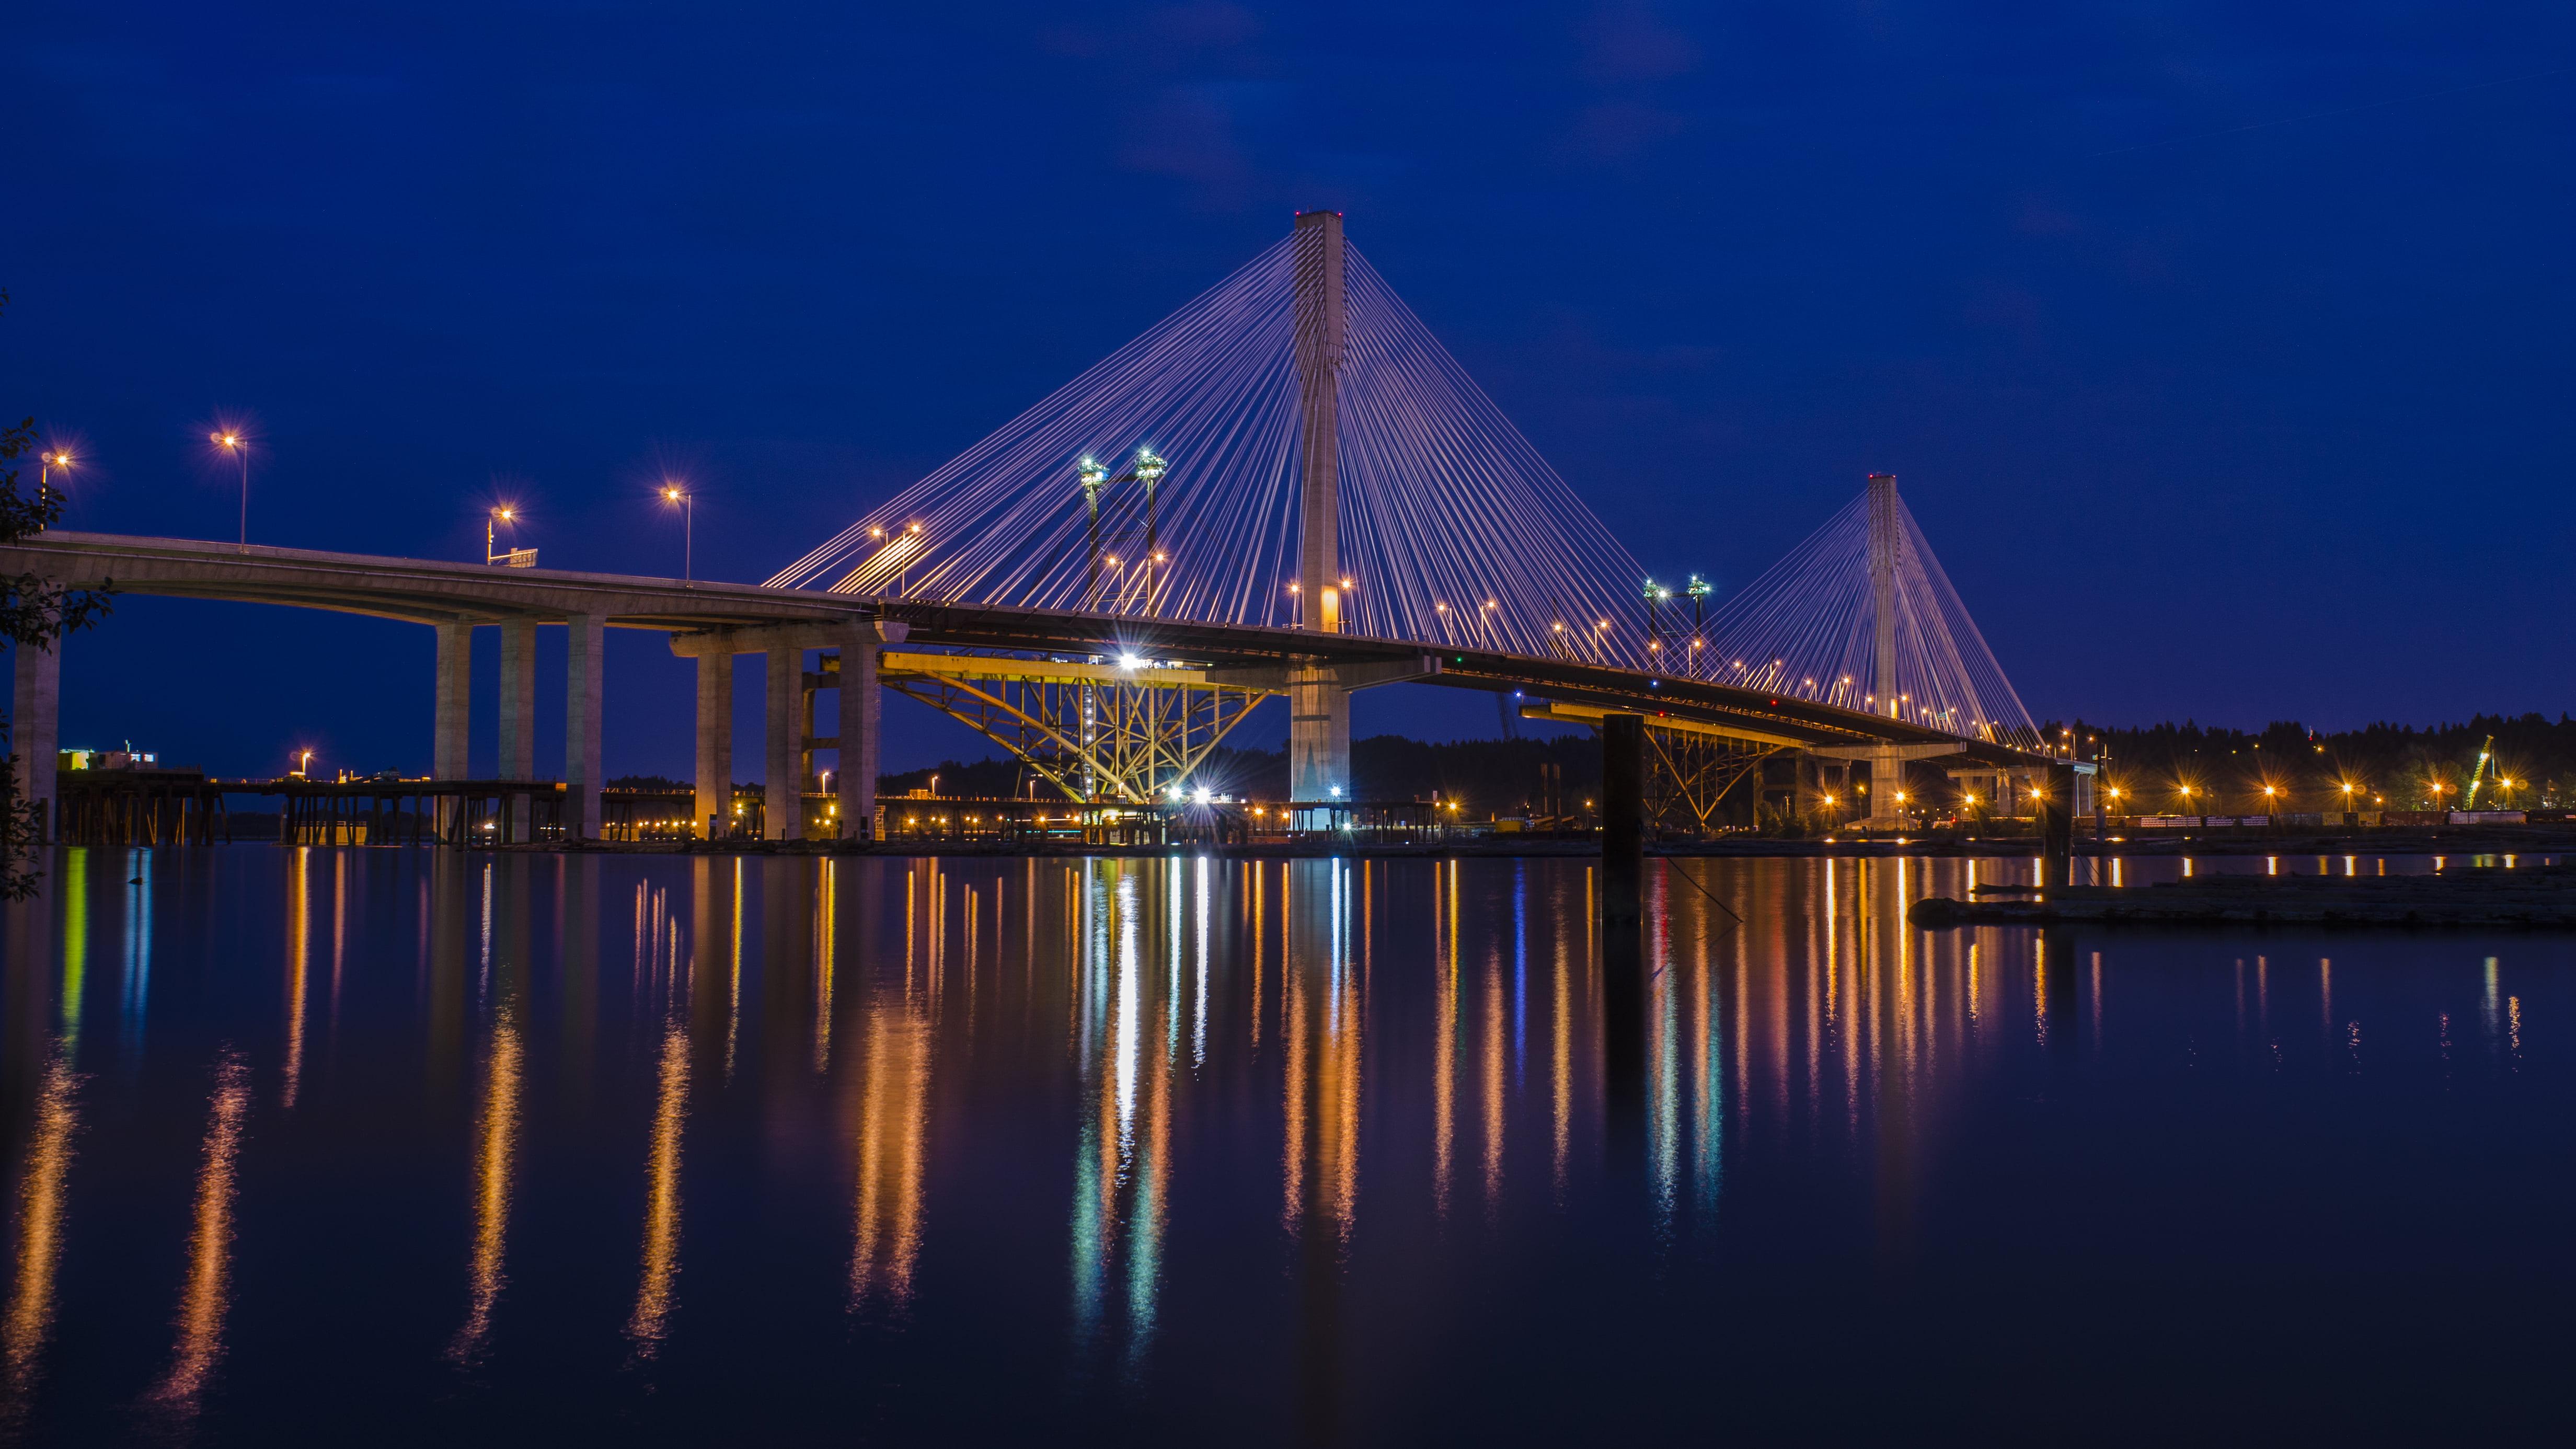 Bridge Port Mann Nighttime Nikon D7000 Night Wallpaper